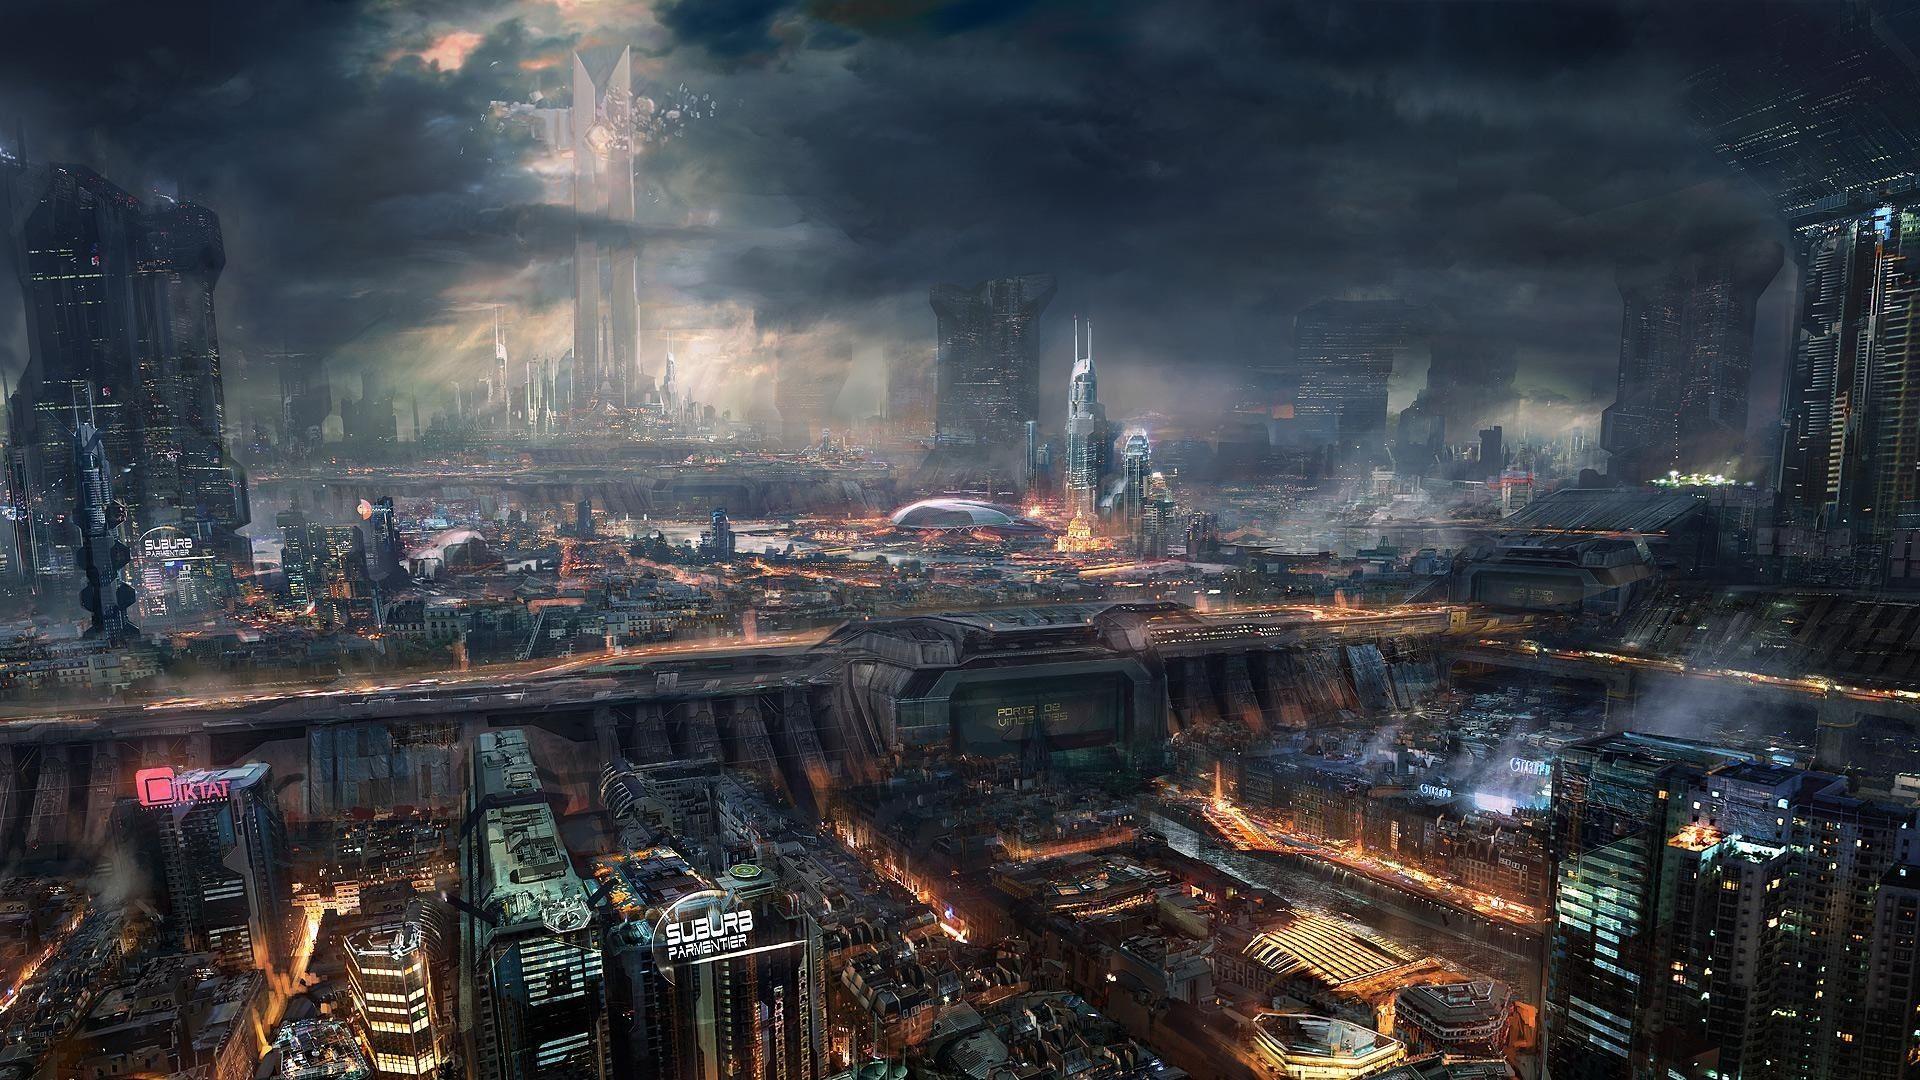 Video Game Adrift City Dark Cg Cgi Digital Art Sci Fi Wallpaper Futuristic City Cyberpunk City Cyberpunk Art